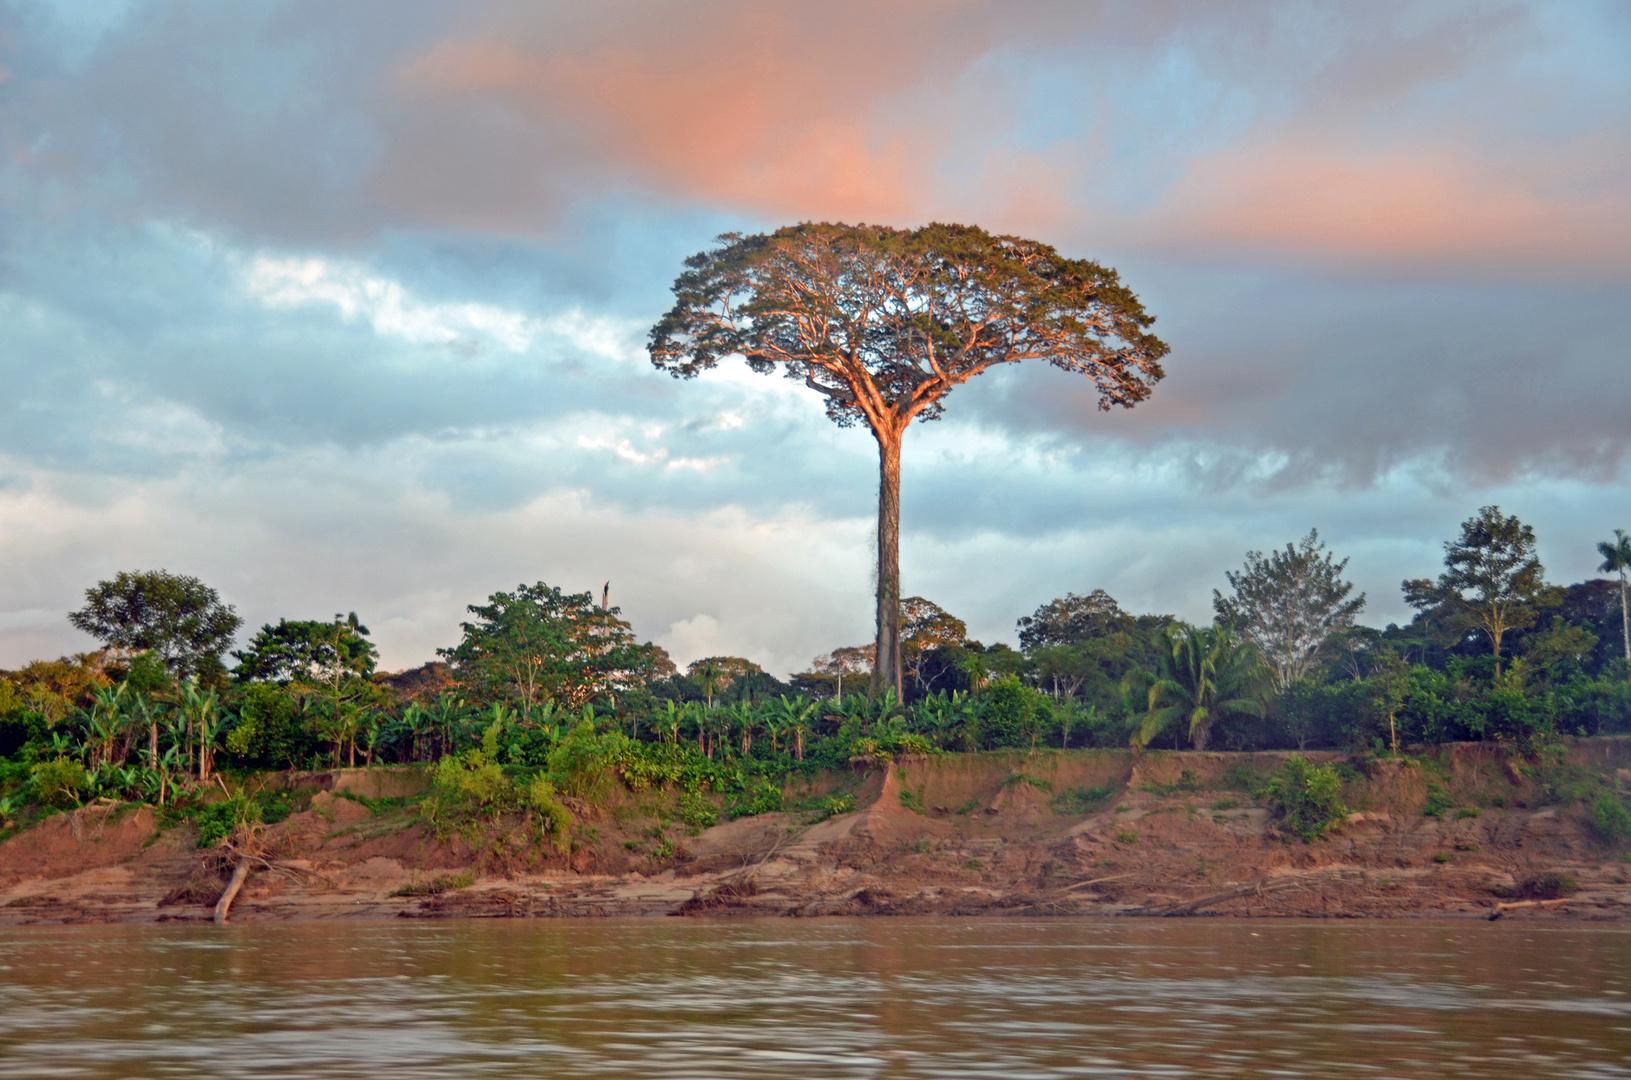 Blick zum Ufer des Rio Tambopata im Südwesten Perus